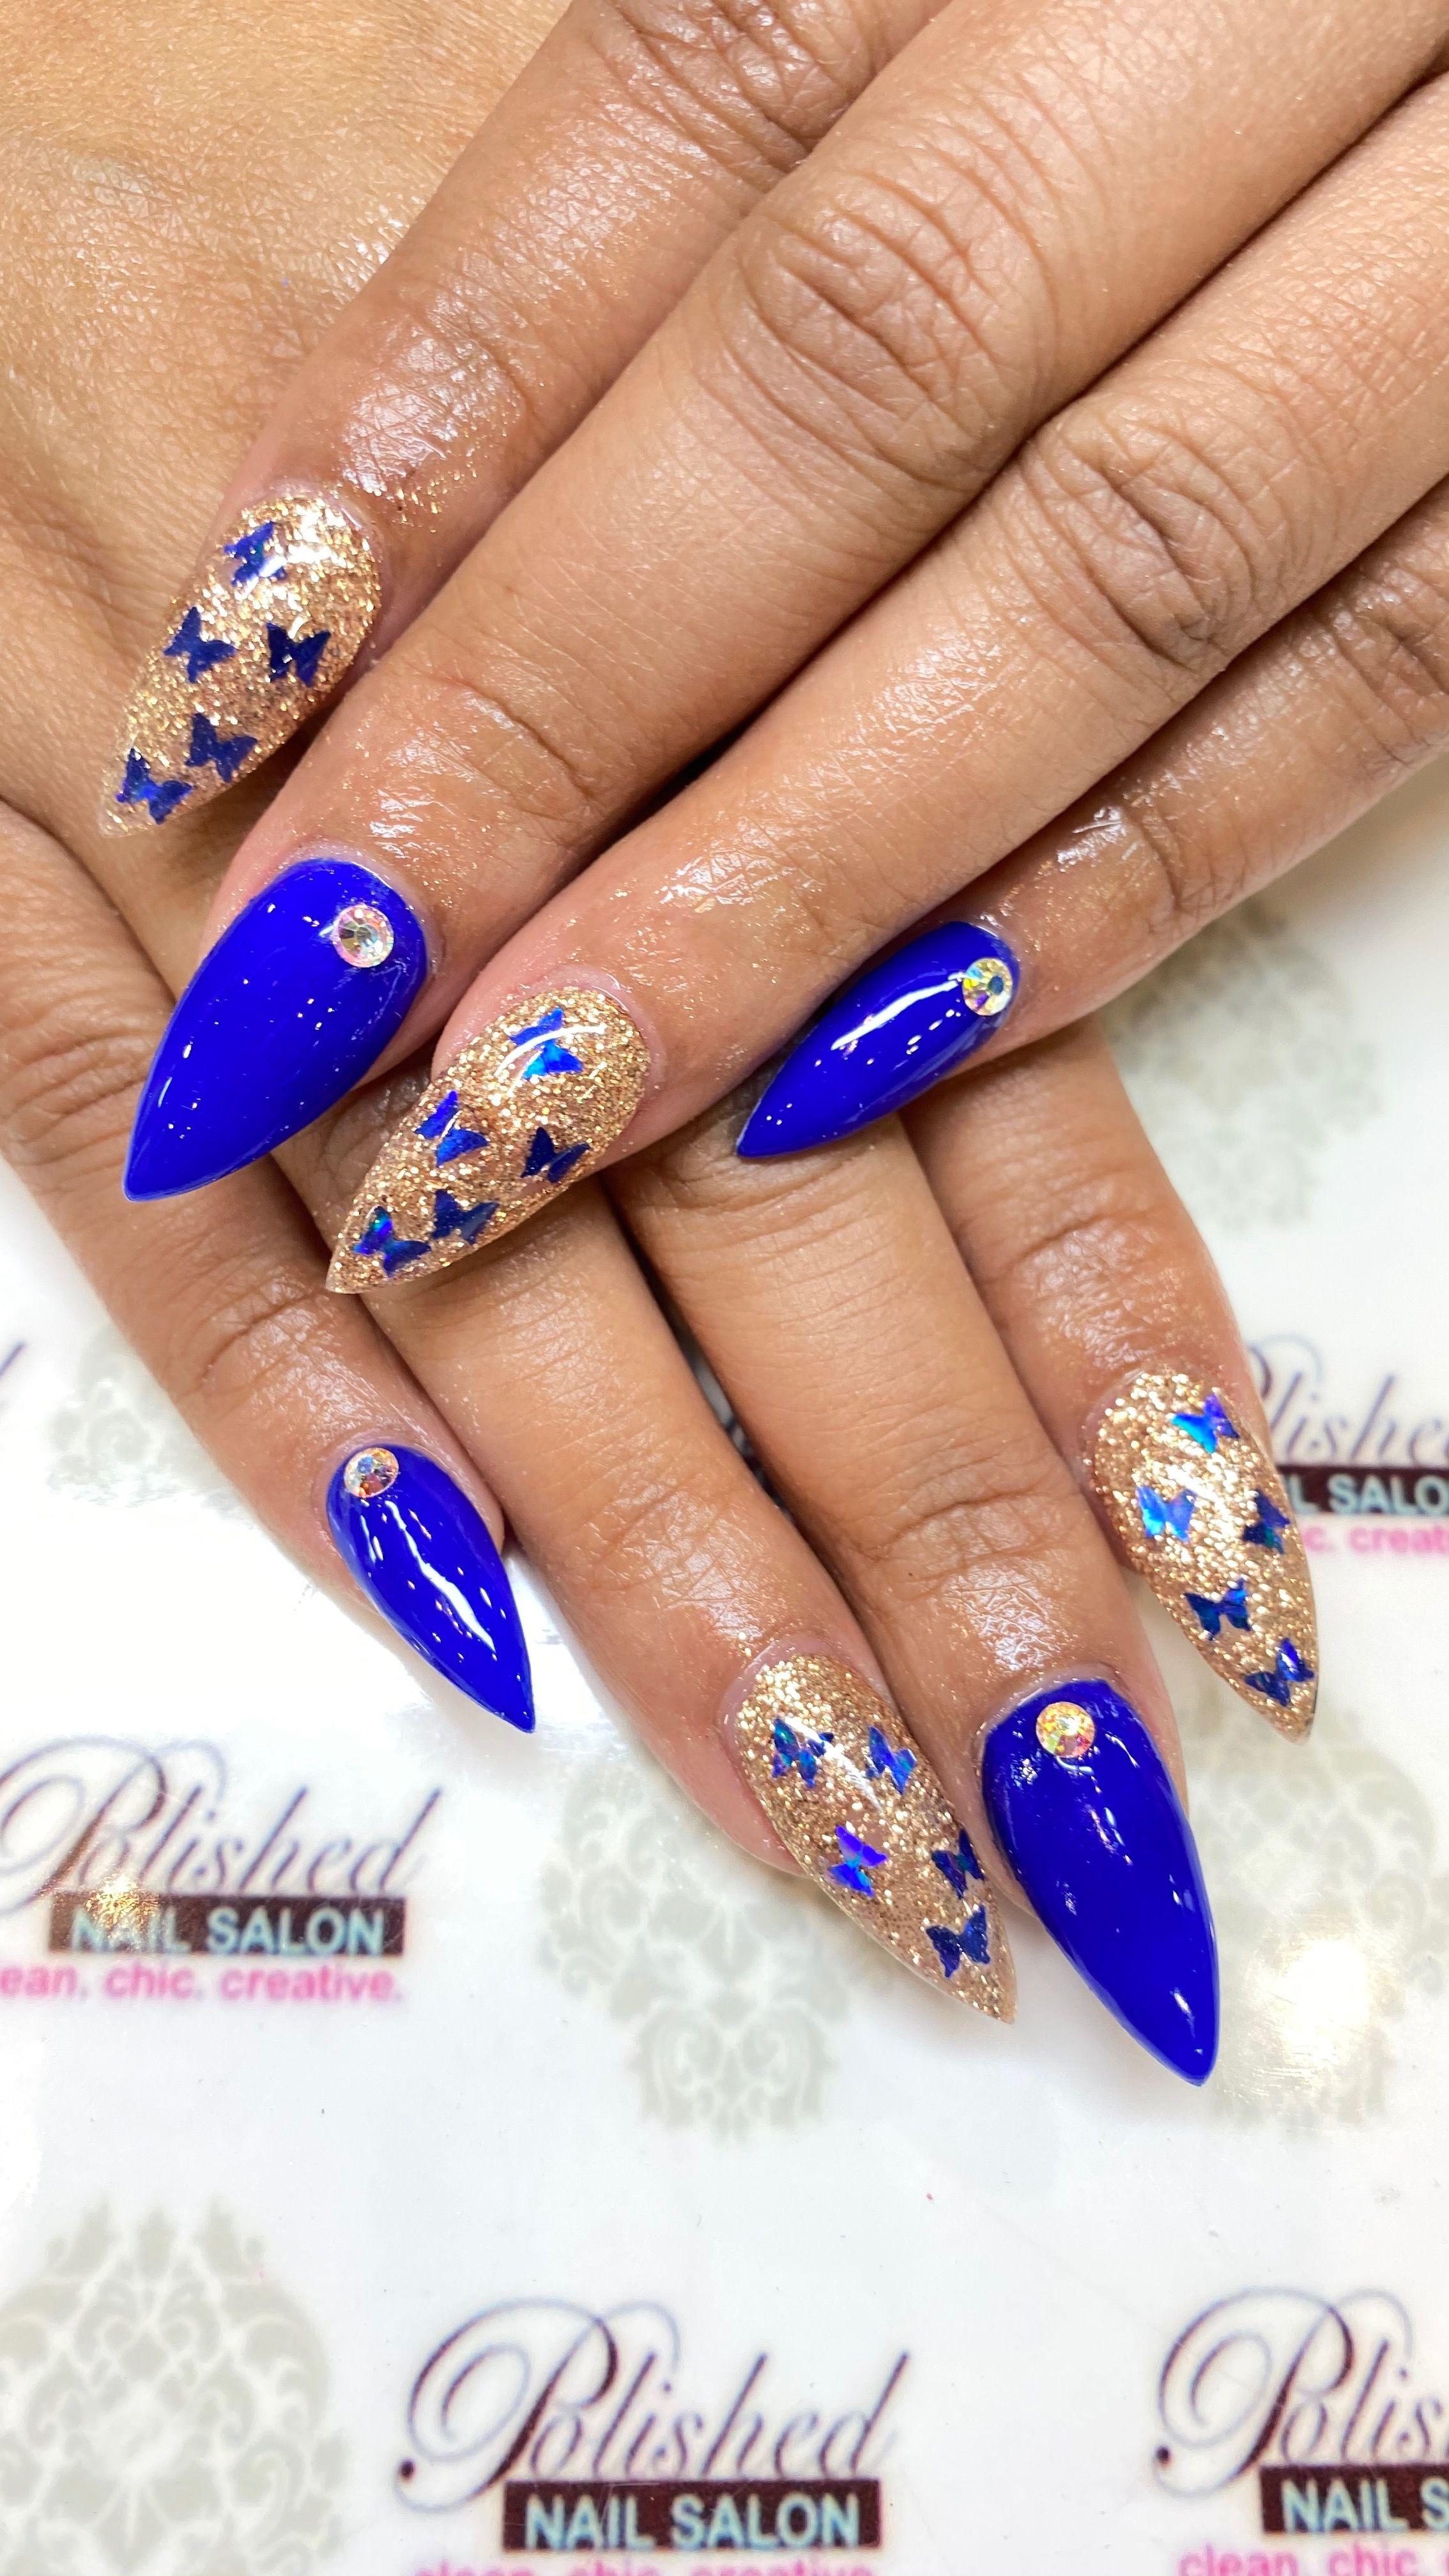 Polished Nails Salon | Clean. Chic. Creative.